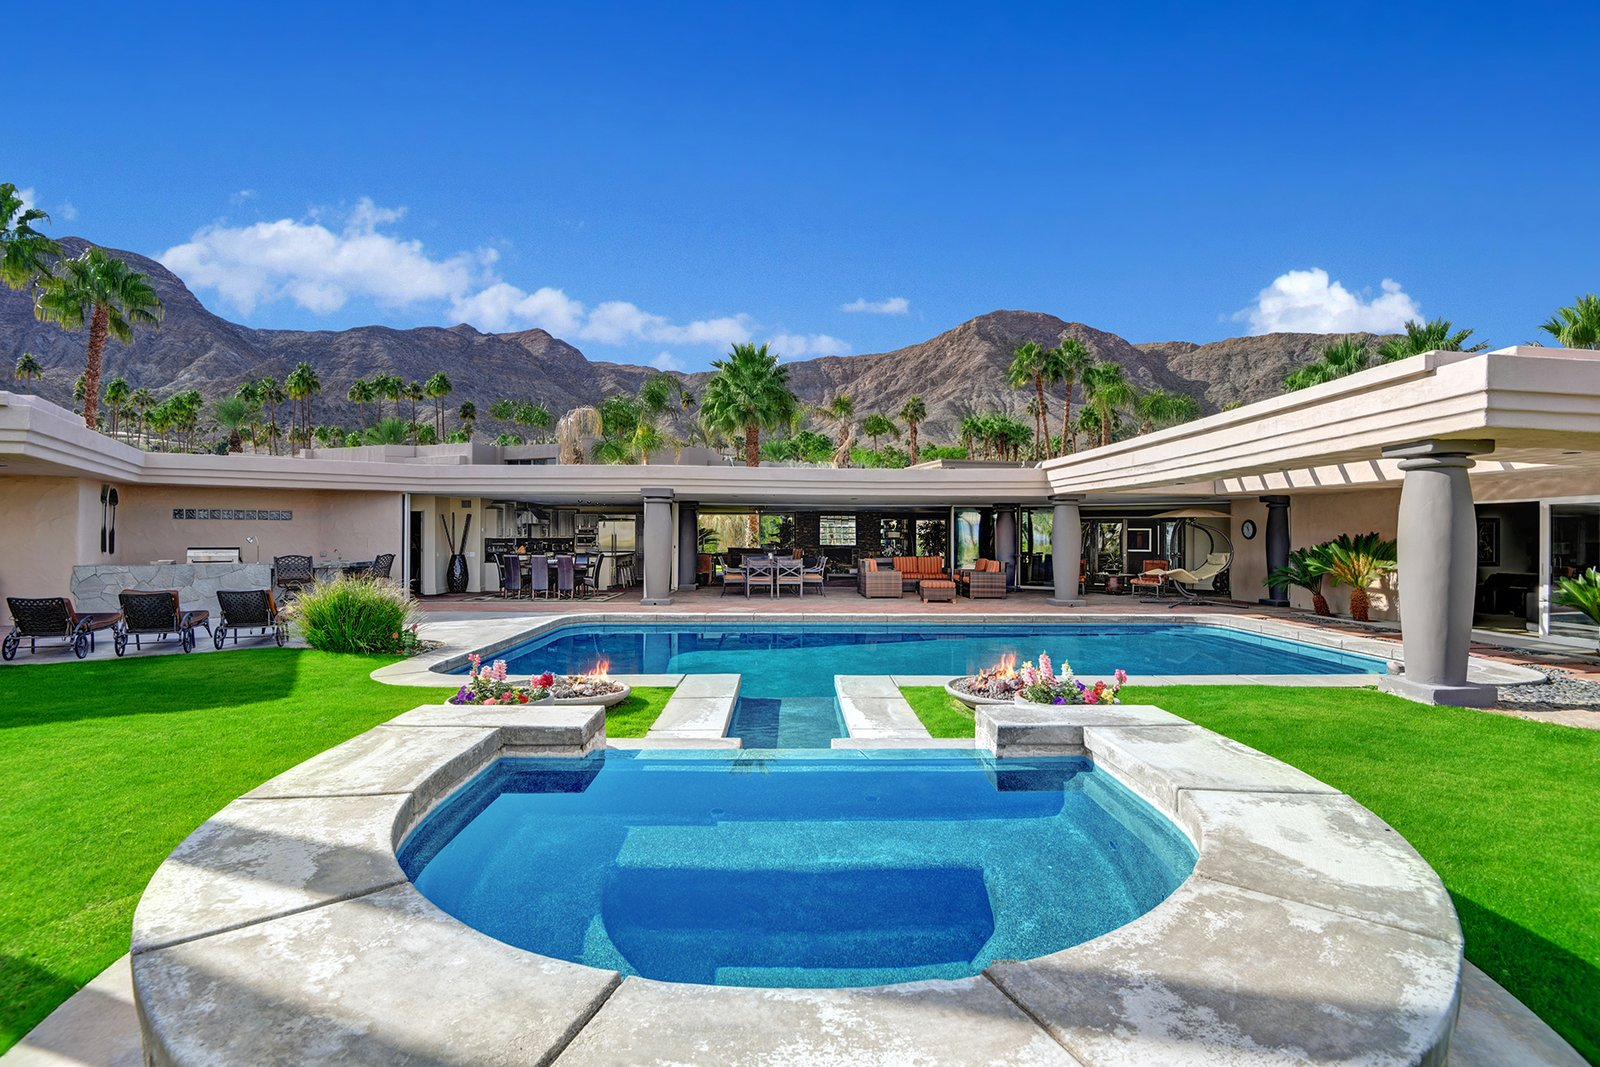 Bing Crosby Rancho Mirage home pool